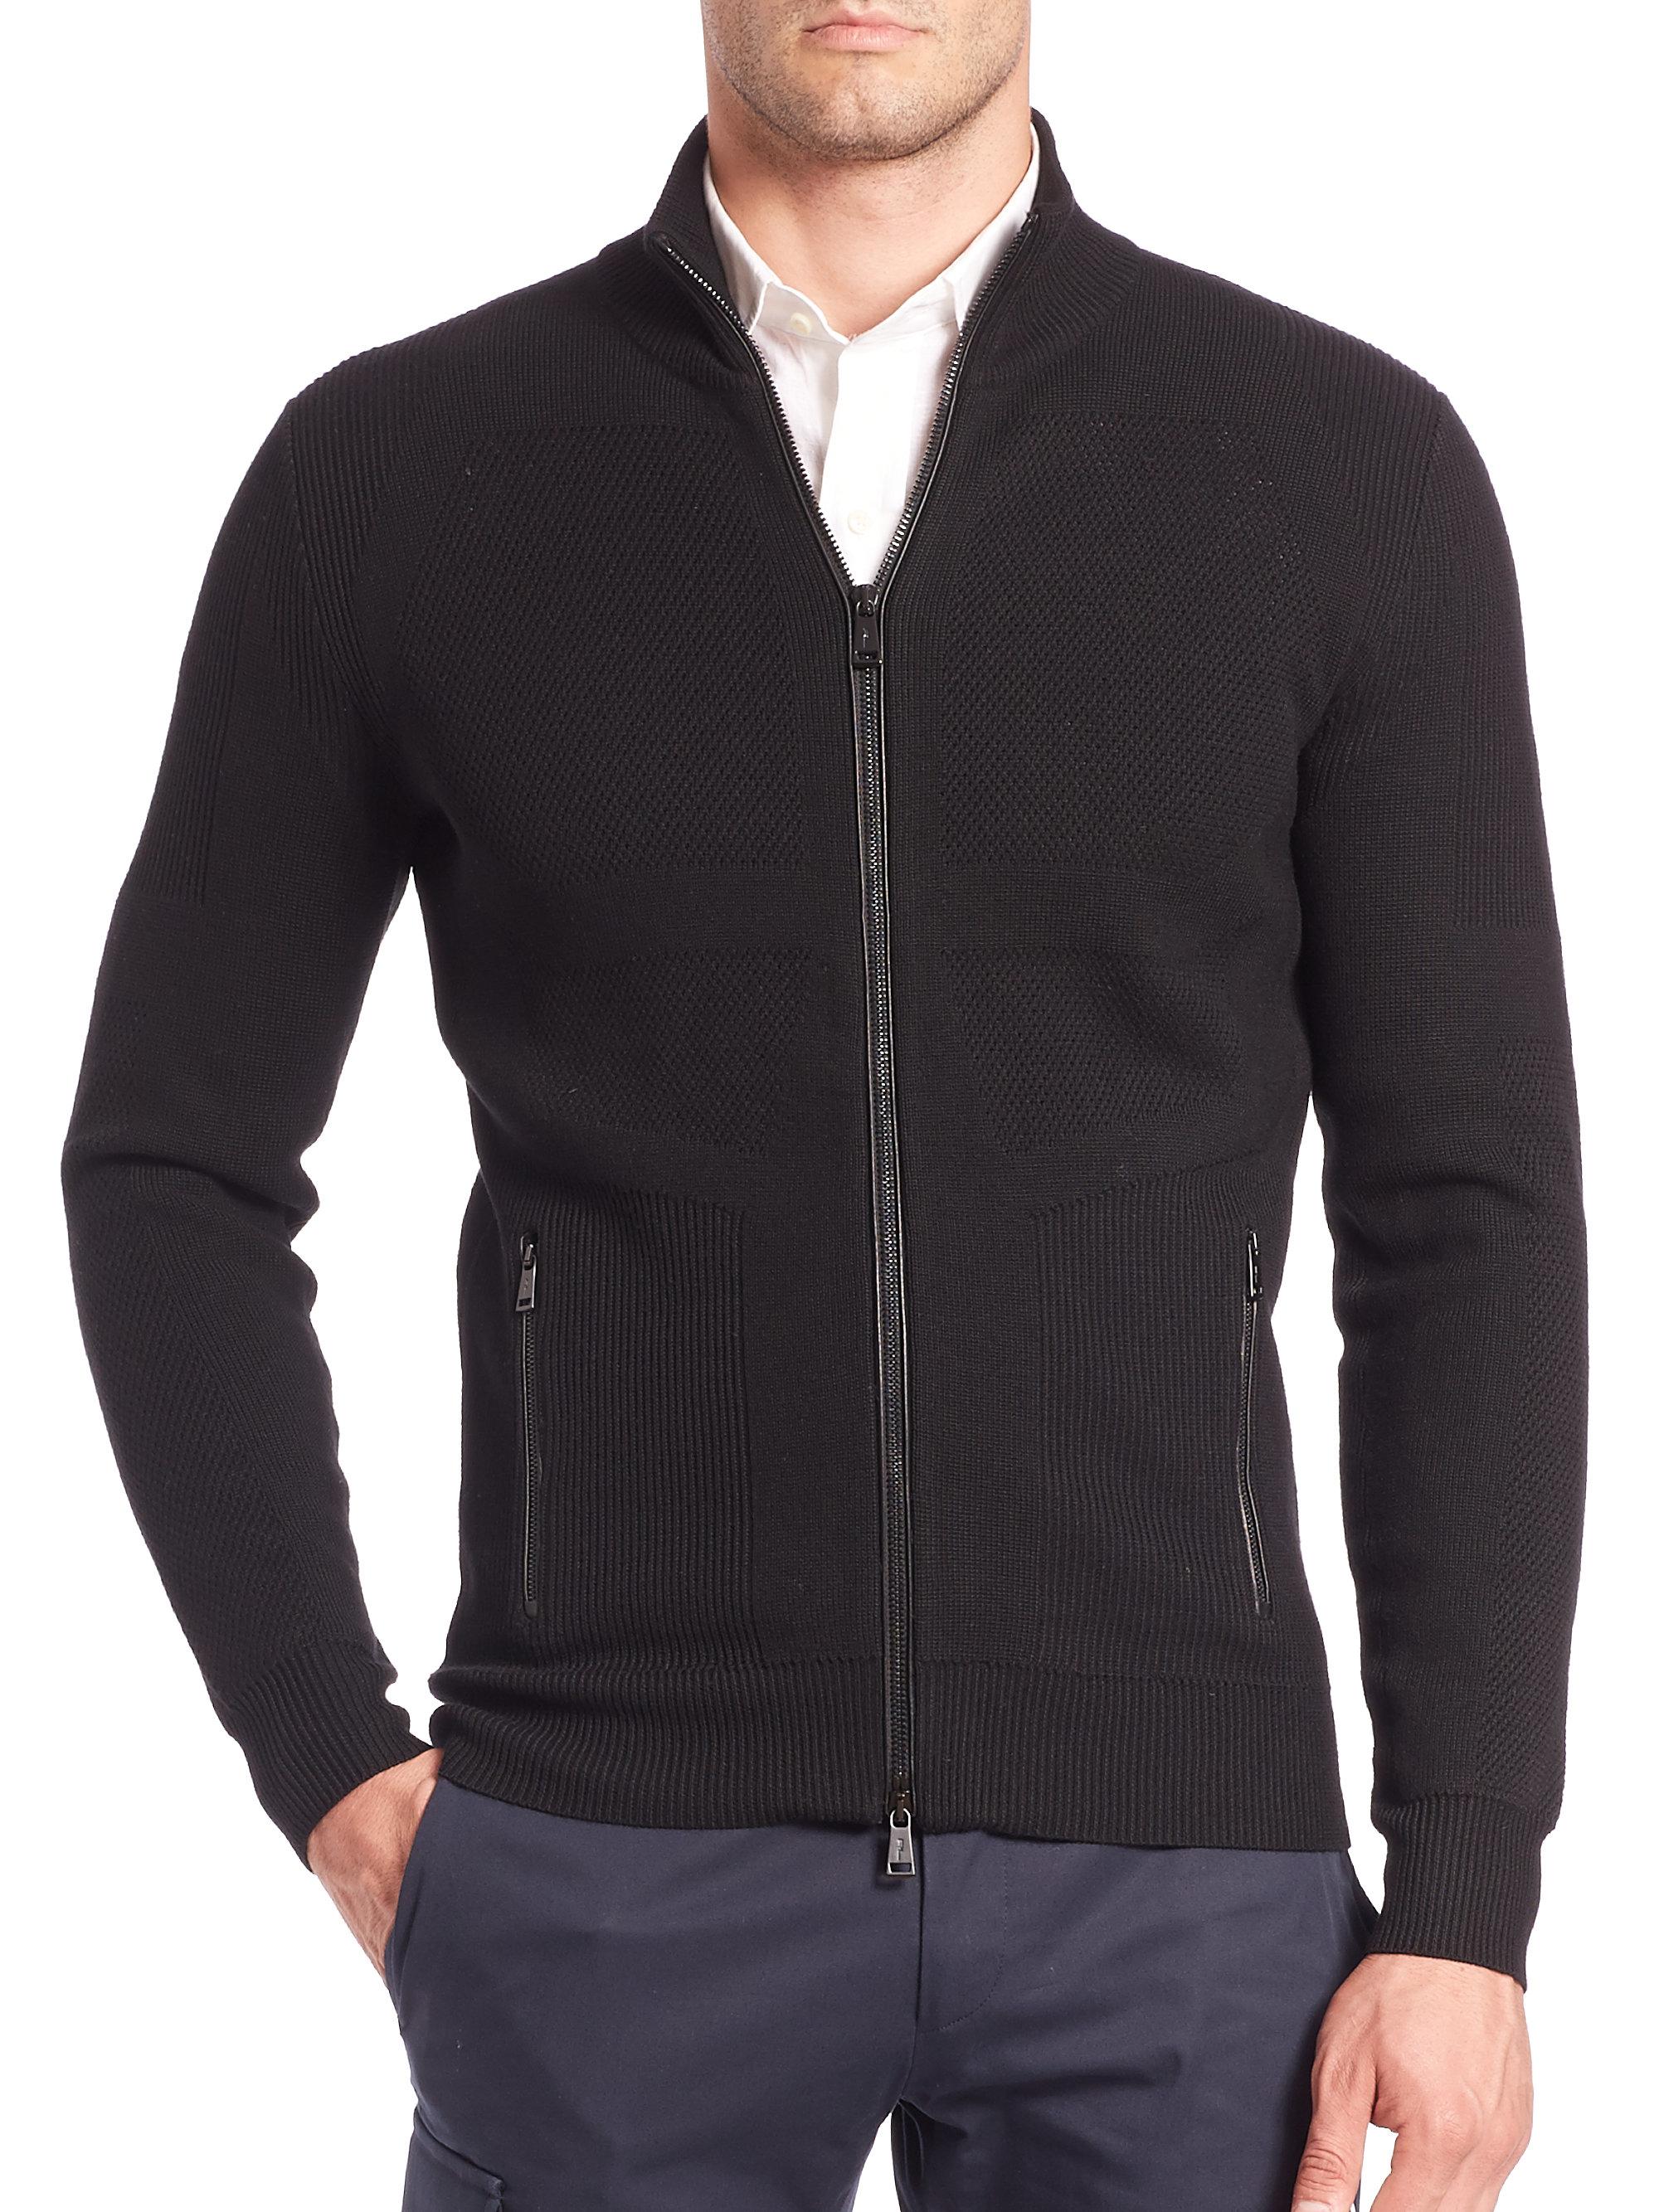 Ralph lauren black label Body-map Merino Wool Sweater in Black for ...